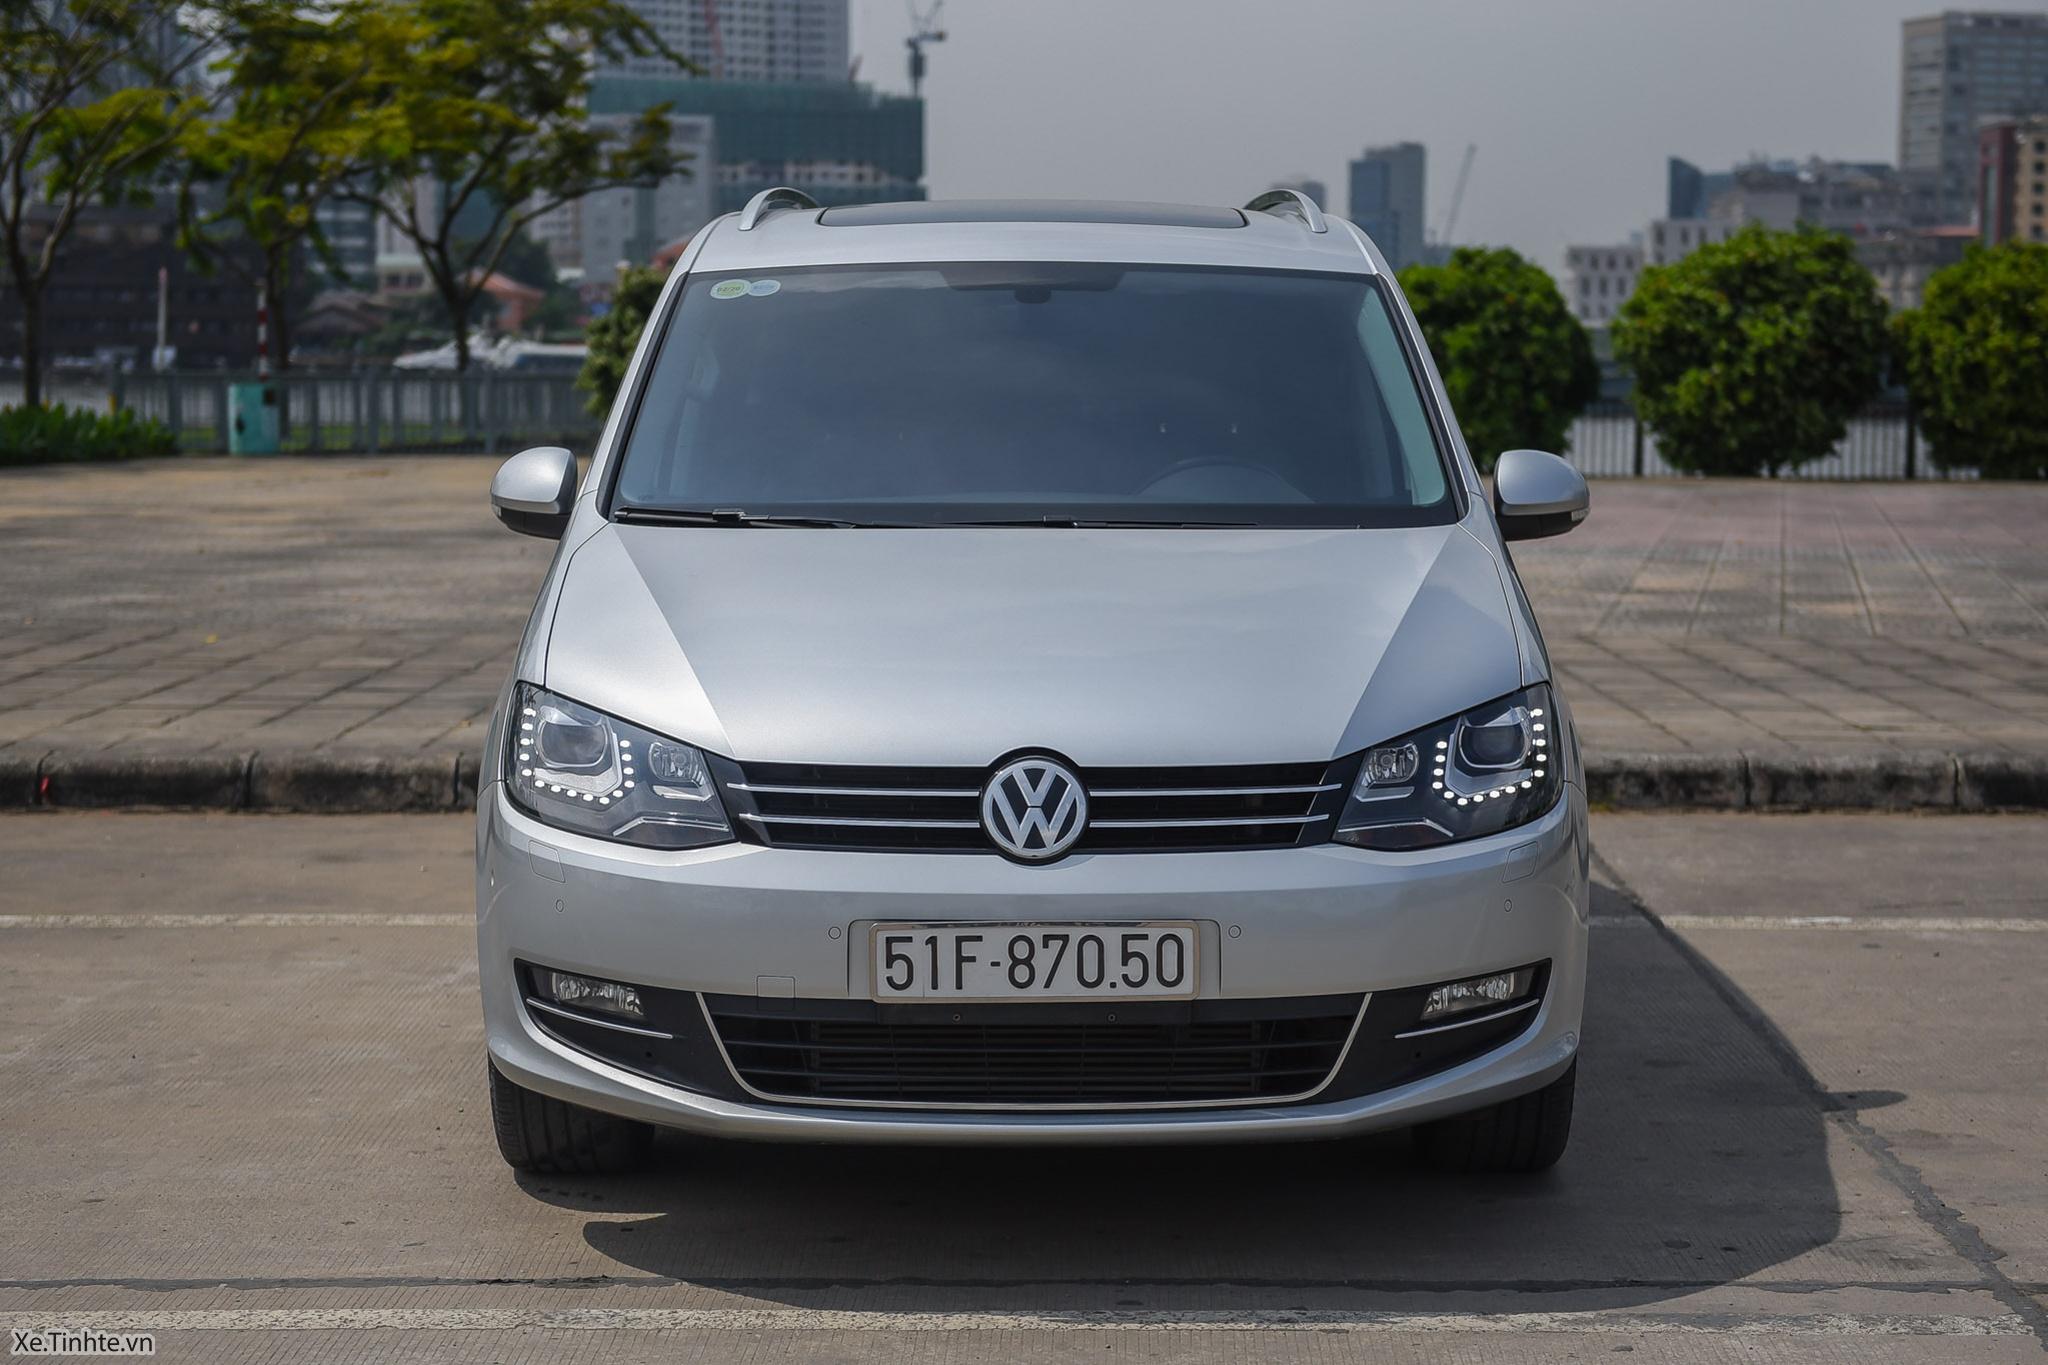 Volkswagen_Sharan_Xe_Tinhte_106.jpg